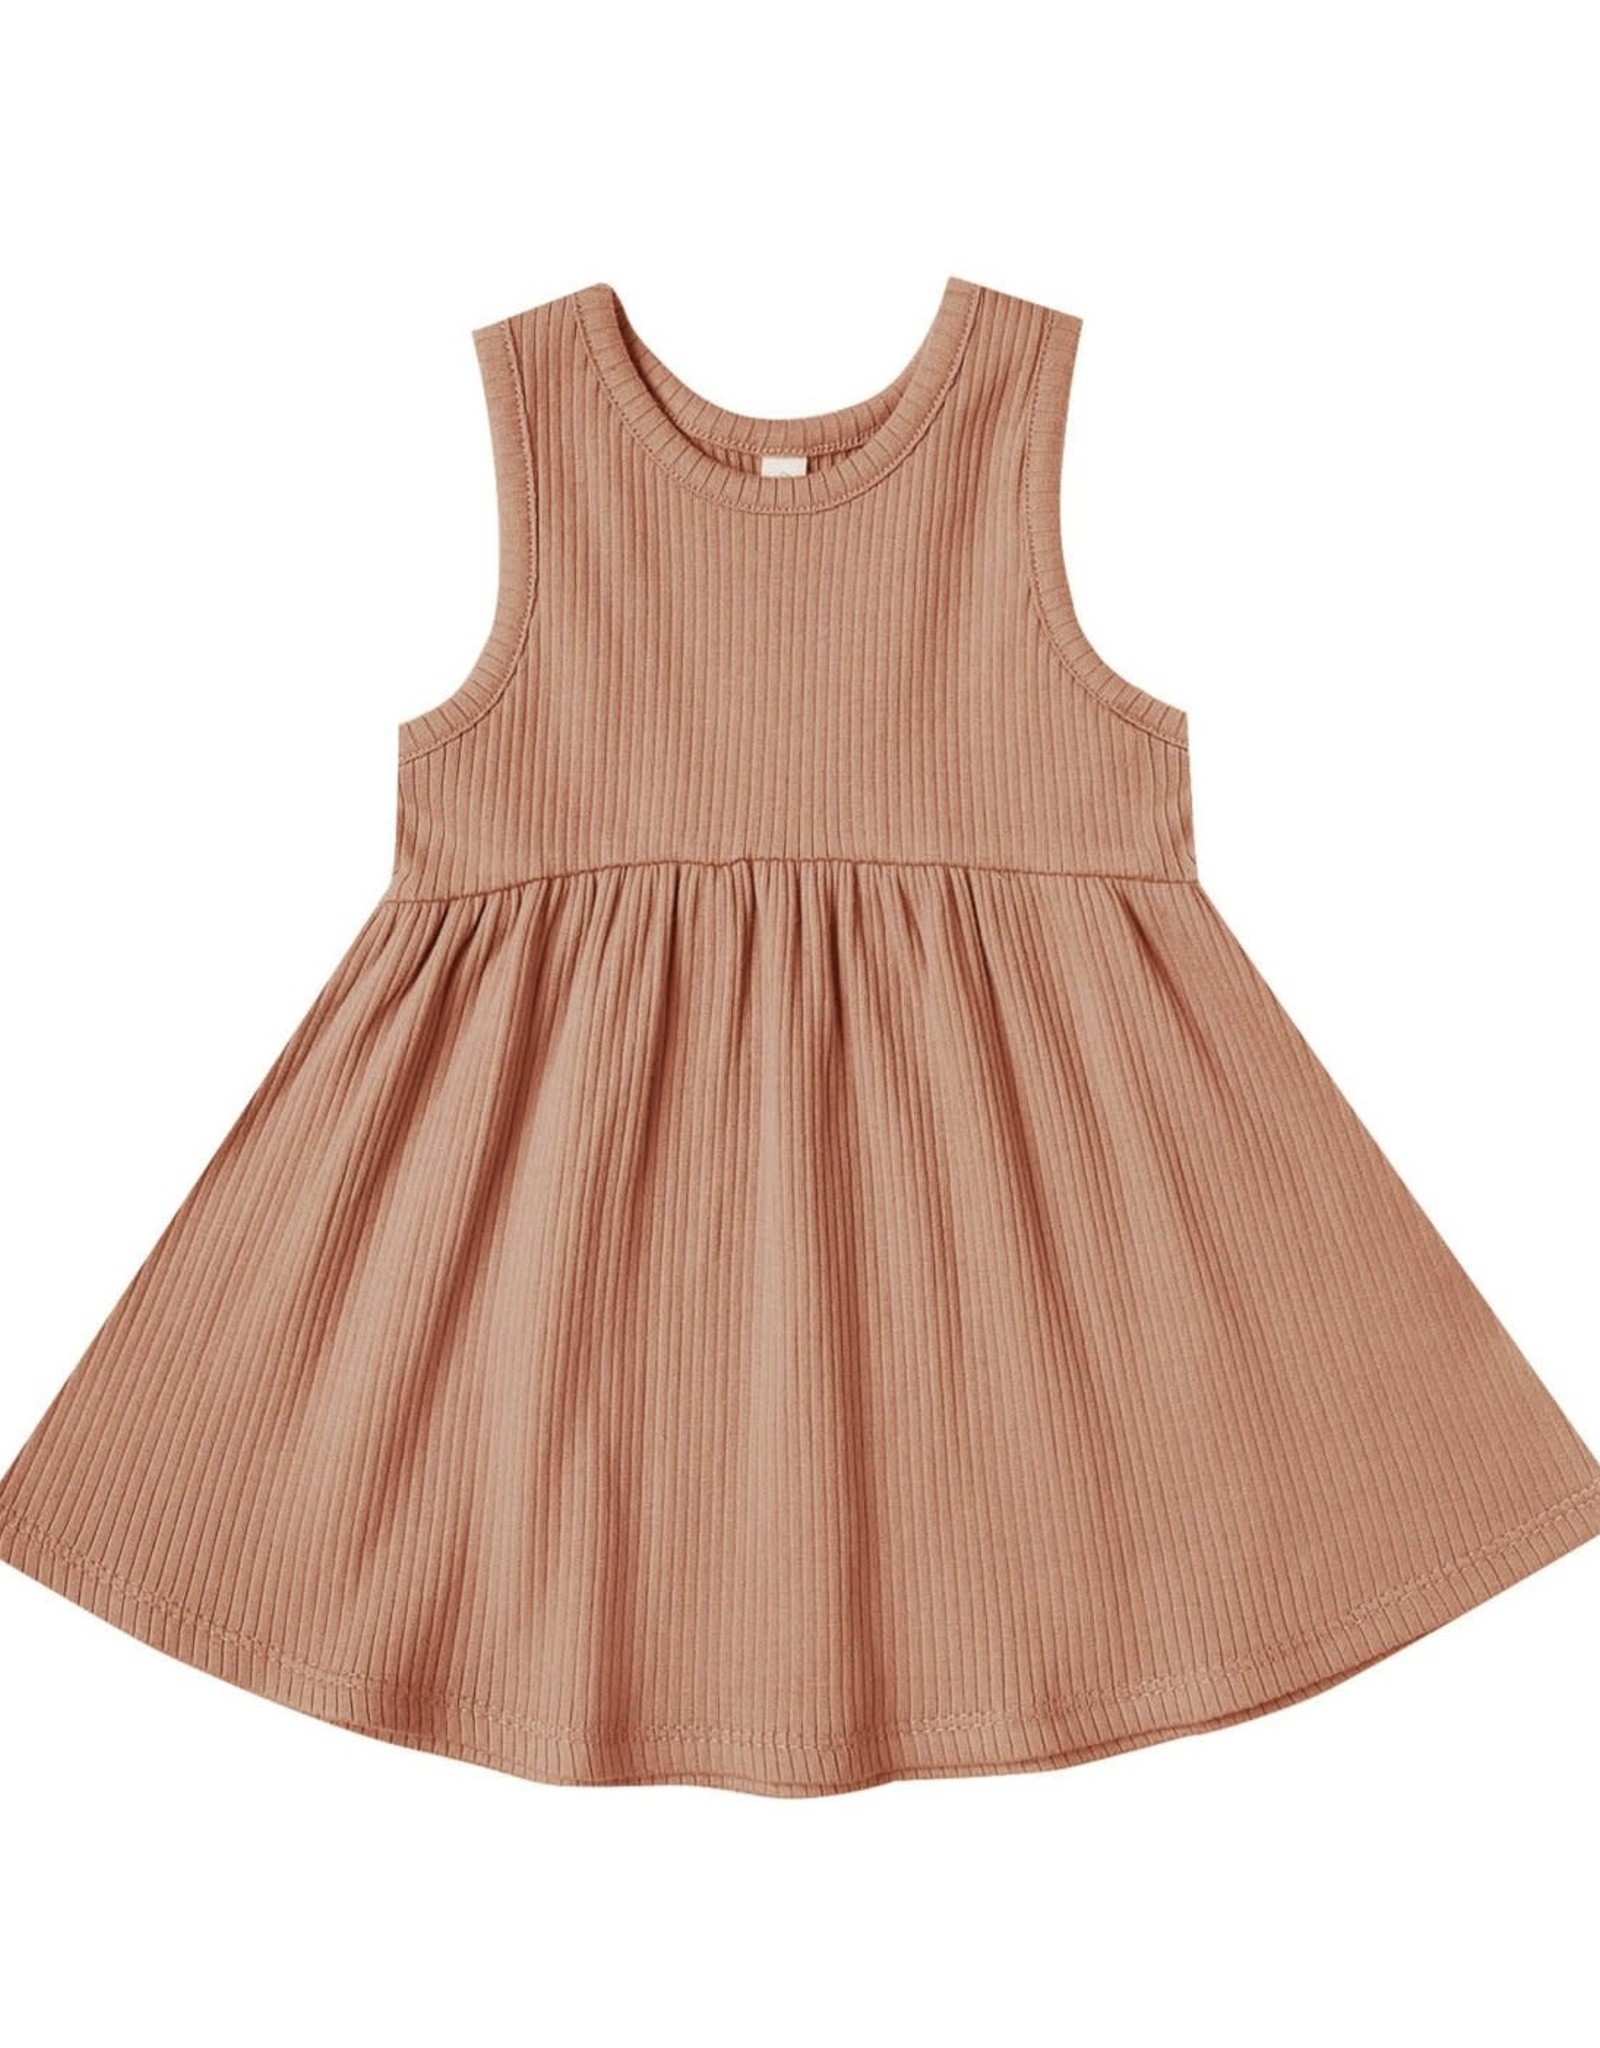 Quincy Mae Quincy Mae Ribbed Tank Dress Terracota